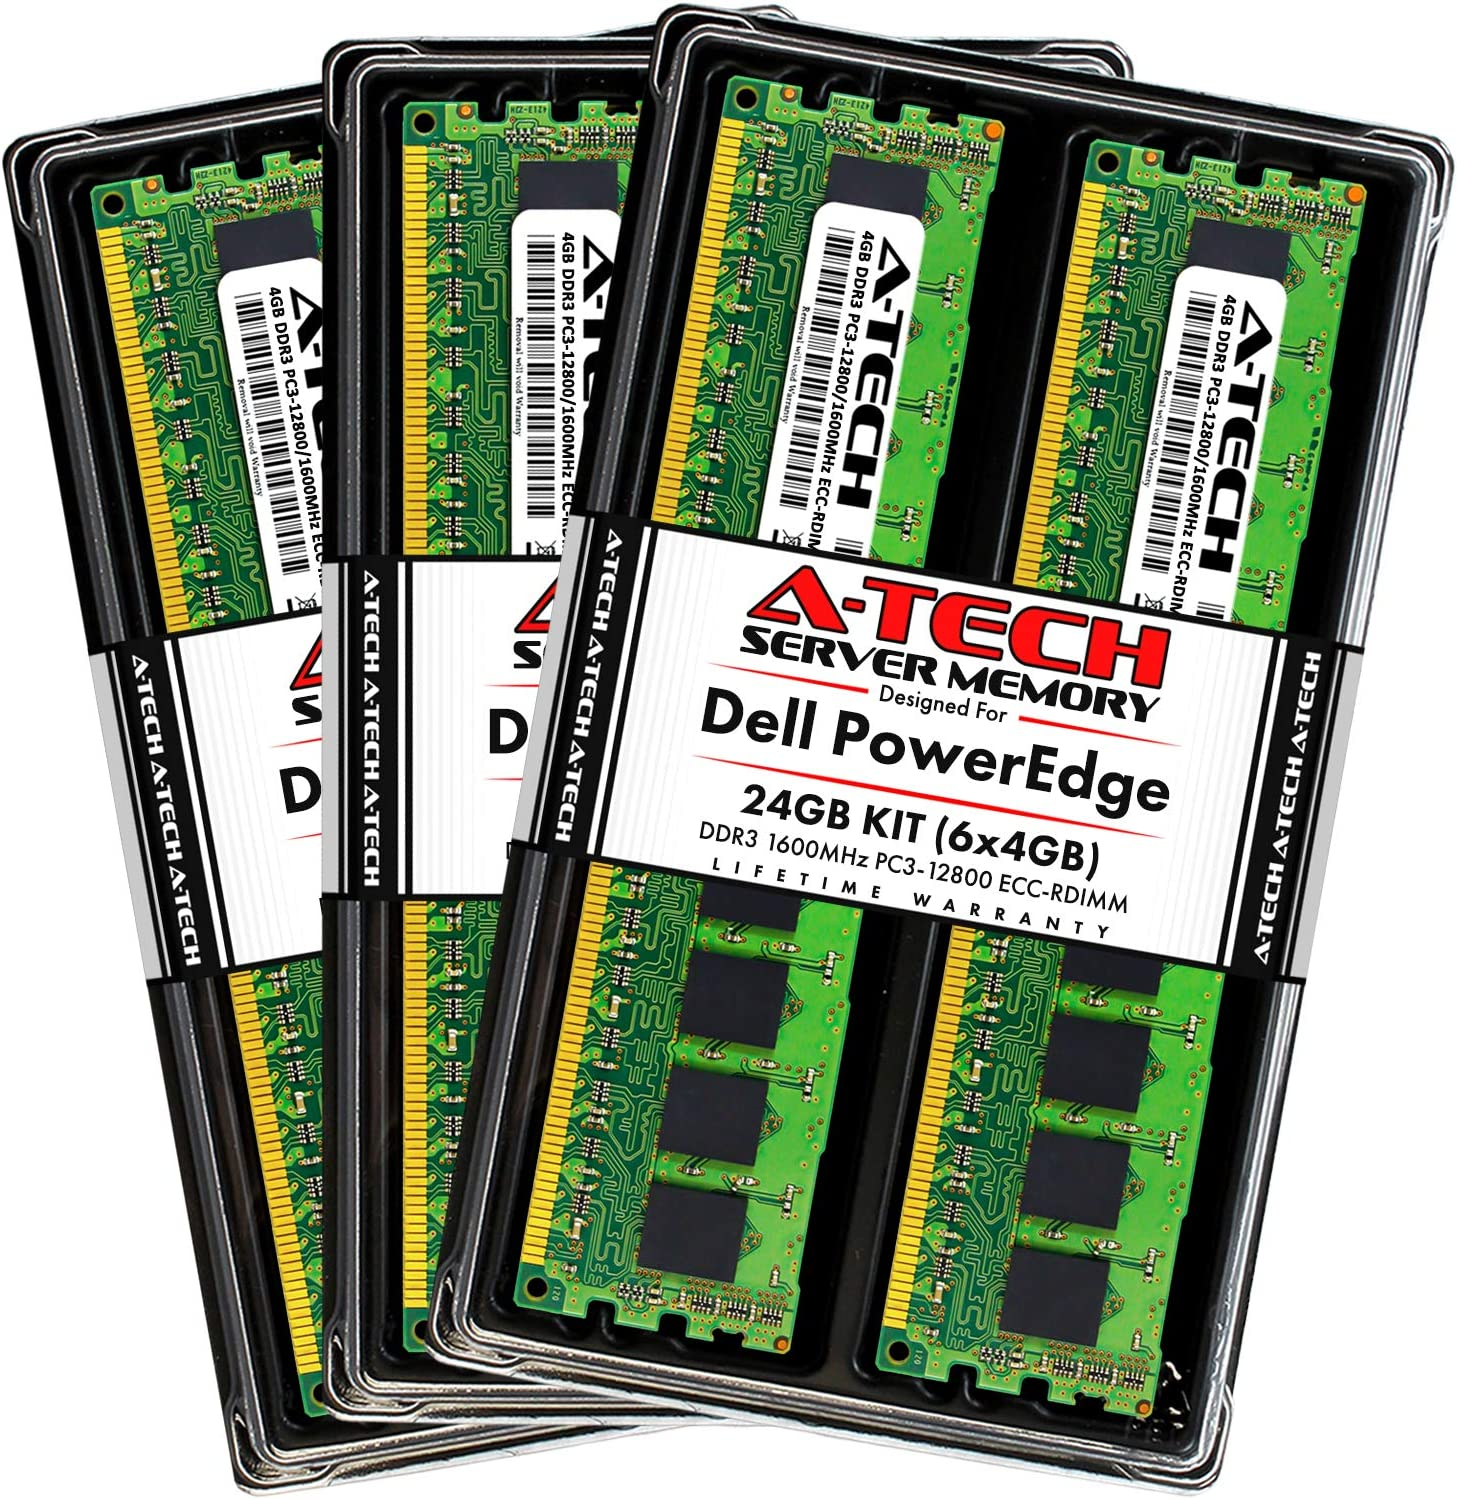 A-Tech 24GB (6x4GB) RAM for Dell PowerEdge R320, R420, R420XR, R520, R620, R720, R720XD, R820, R920 | DDR3 1600MHz ECC-RDIMM PC3-12800 1Rx4 1.5V ECC Registered DIMM Server Memory Upgrade Kit